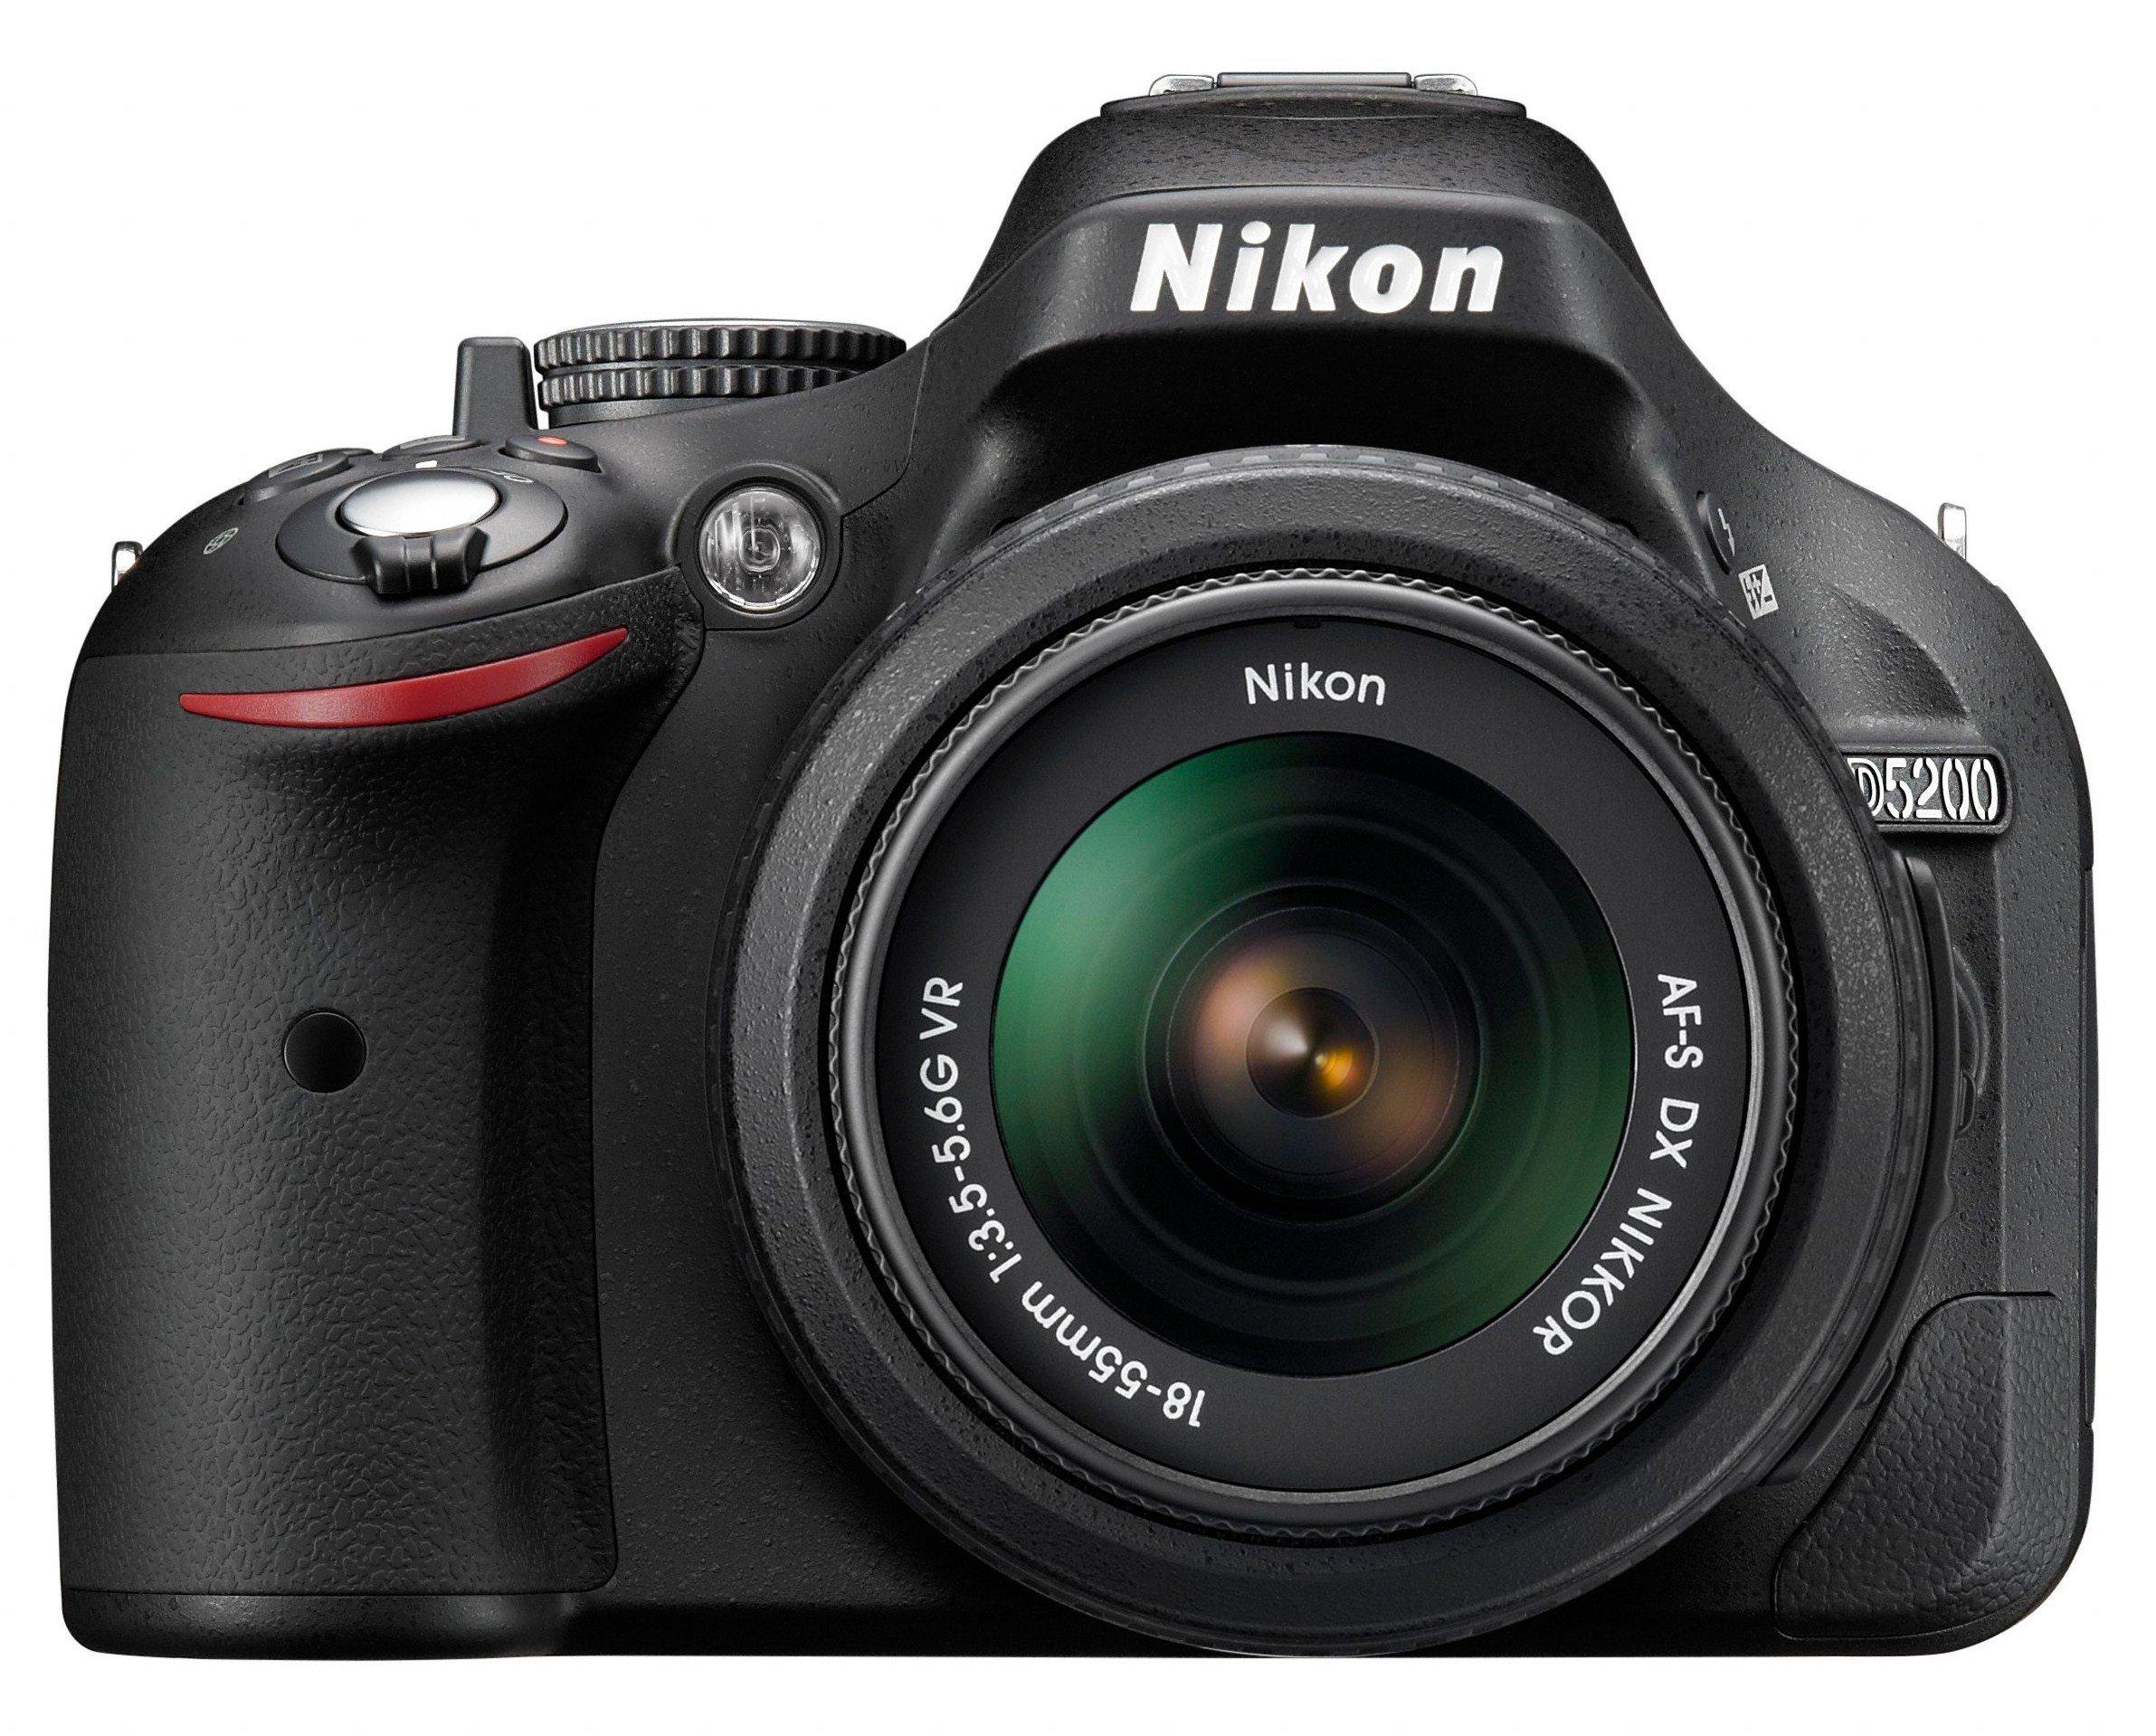 Nikon D5200 Fotocamera Digitale SLR, 24.1 Megapixel, Display TFT da 3 Pollici, Kit incluso Obiettivo AF-S DX 18-55mm VR [Versione EU] product image